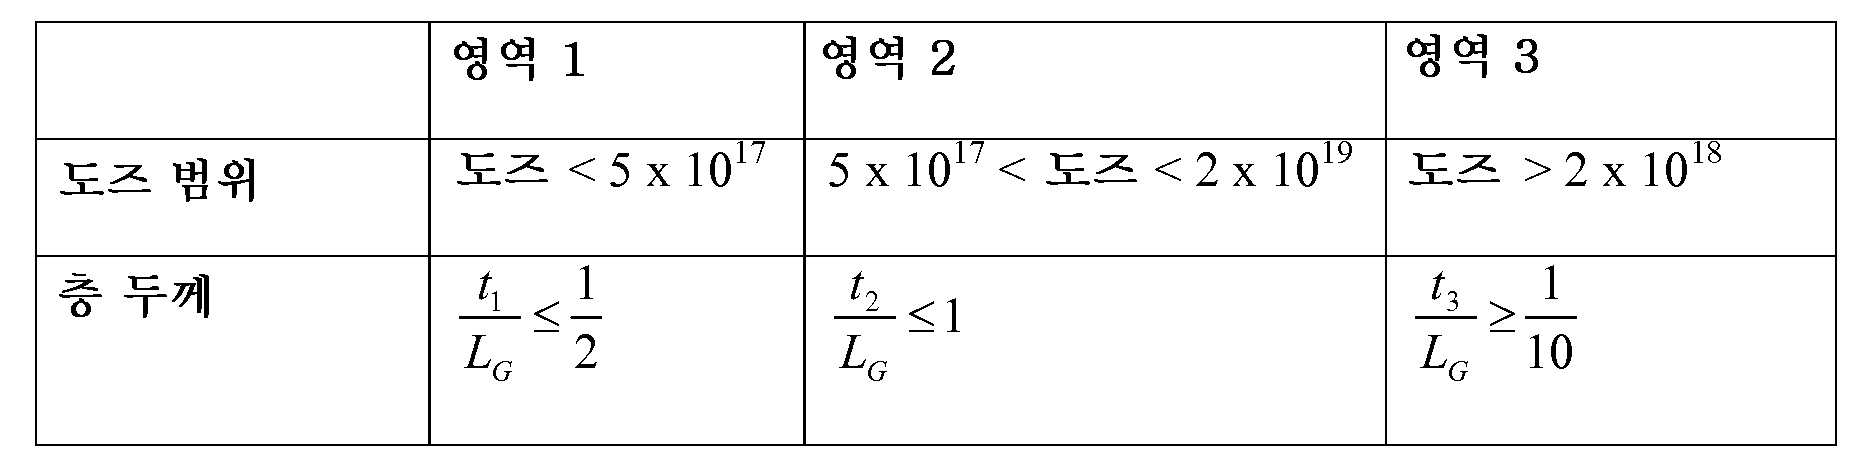 Figure 112012034006695-pct00001